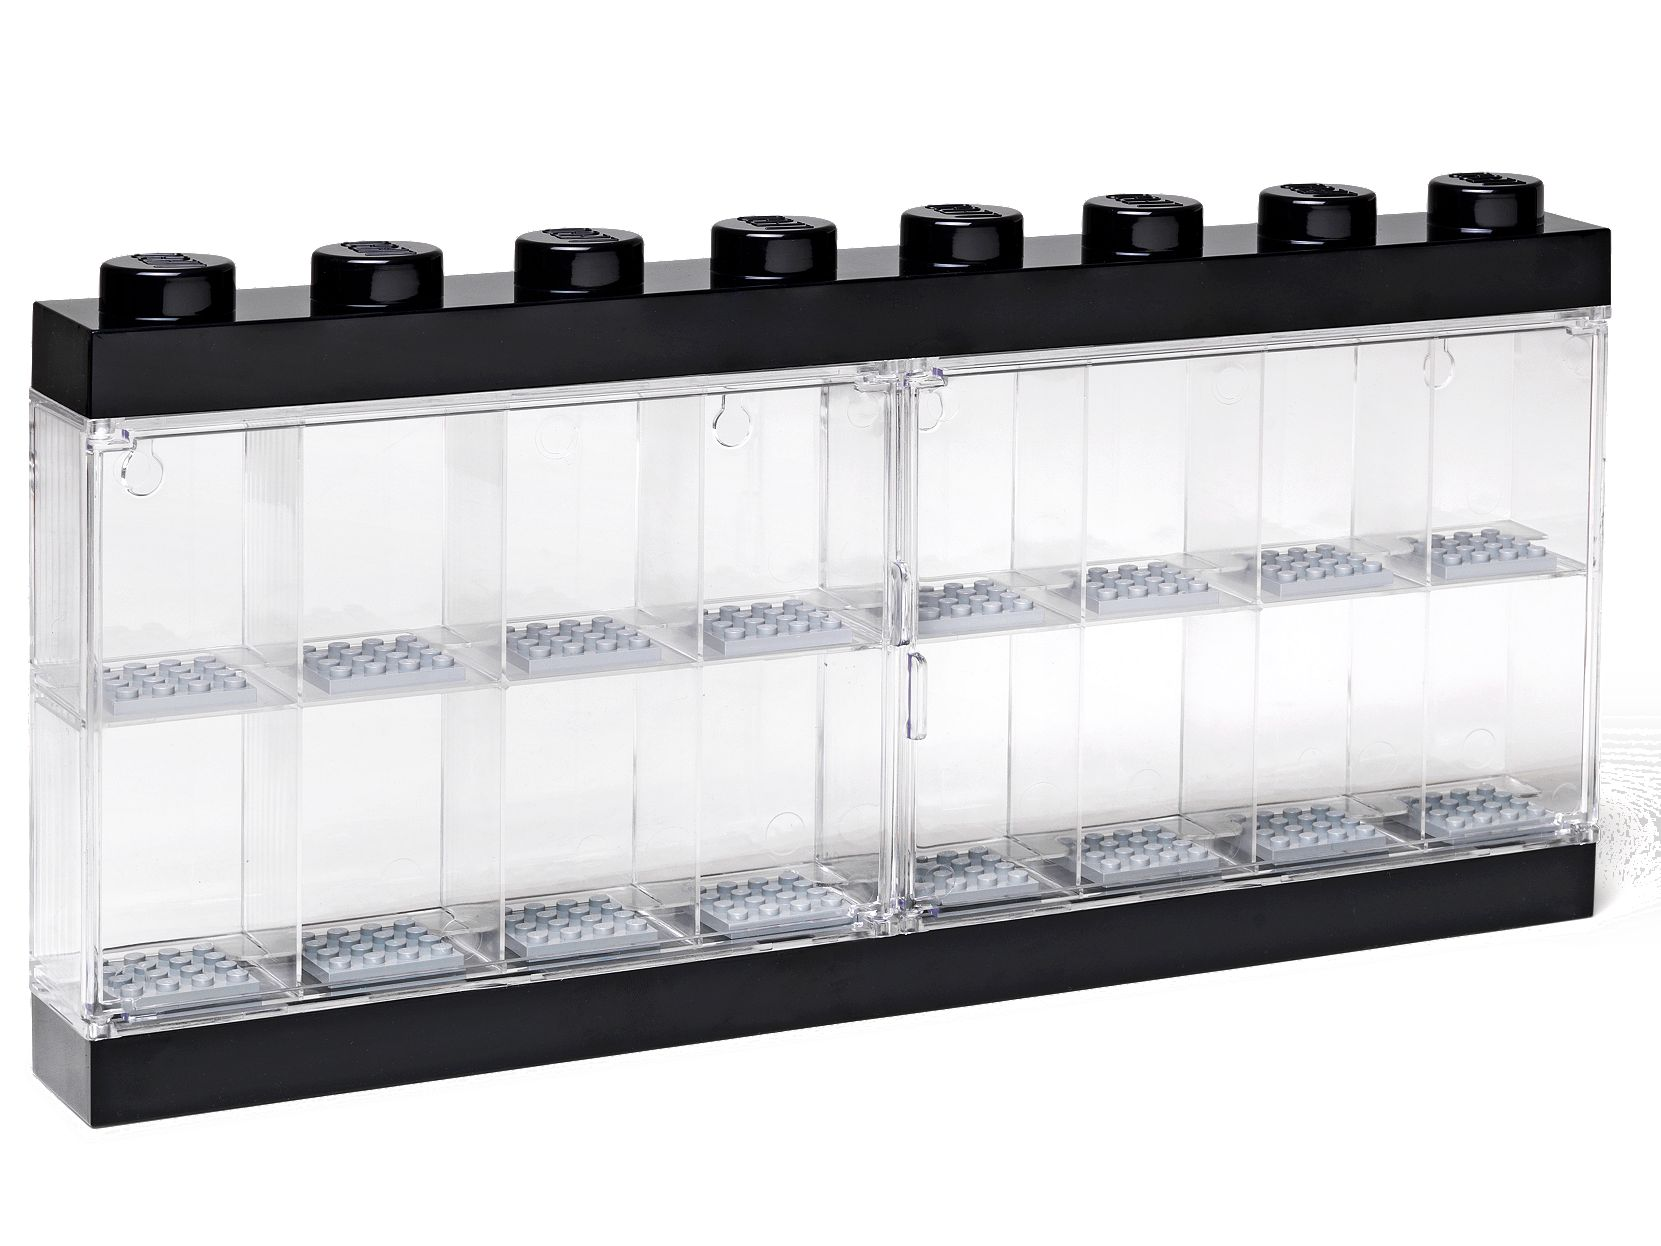 Bedwelming LEGO® Minifigure Display Case 16 - 5005375 | UNKNOWN | LEGO Shop &NE19